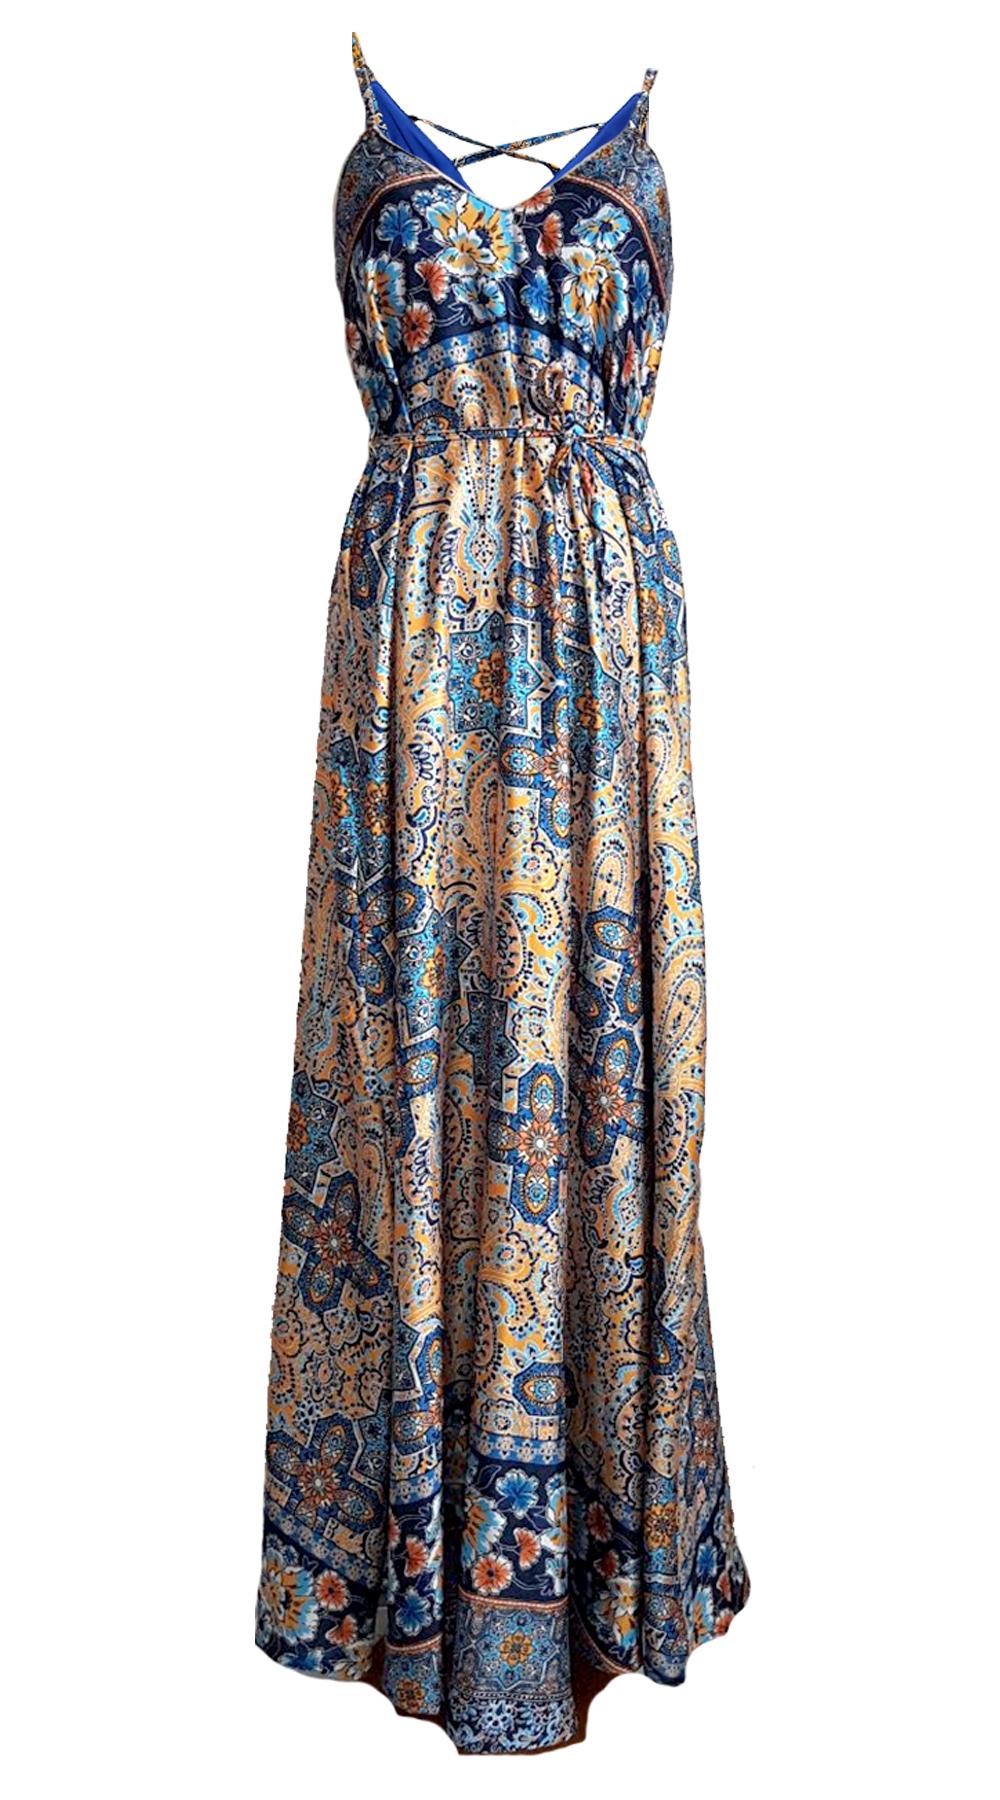 916613682b10 Maxi Εξώπλατο Εμπριμέ Φόρεμα